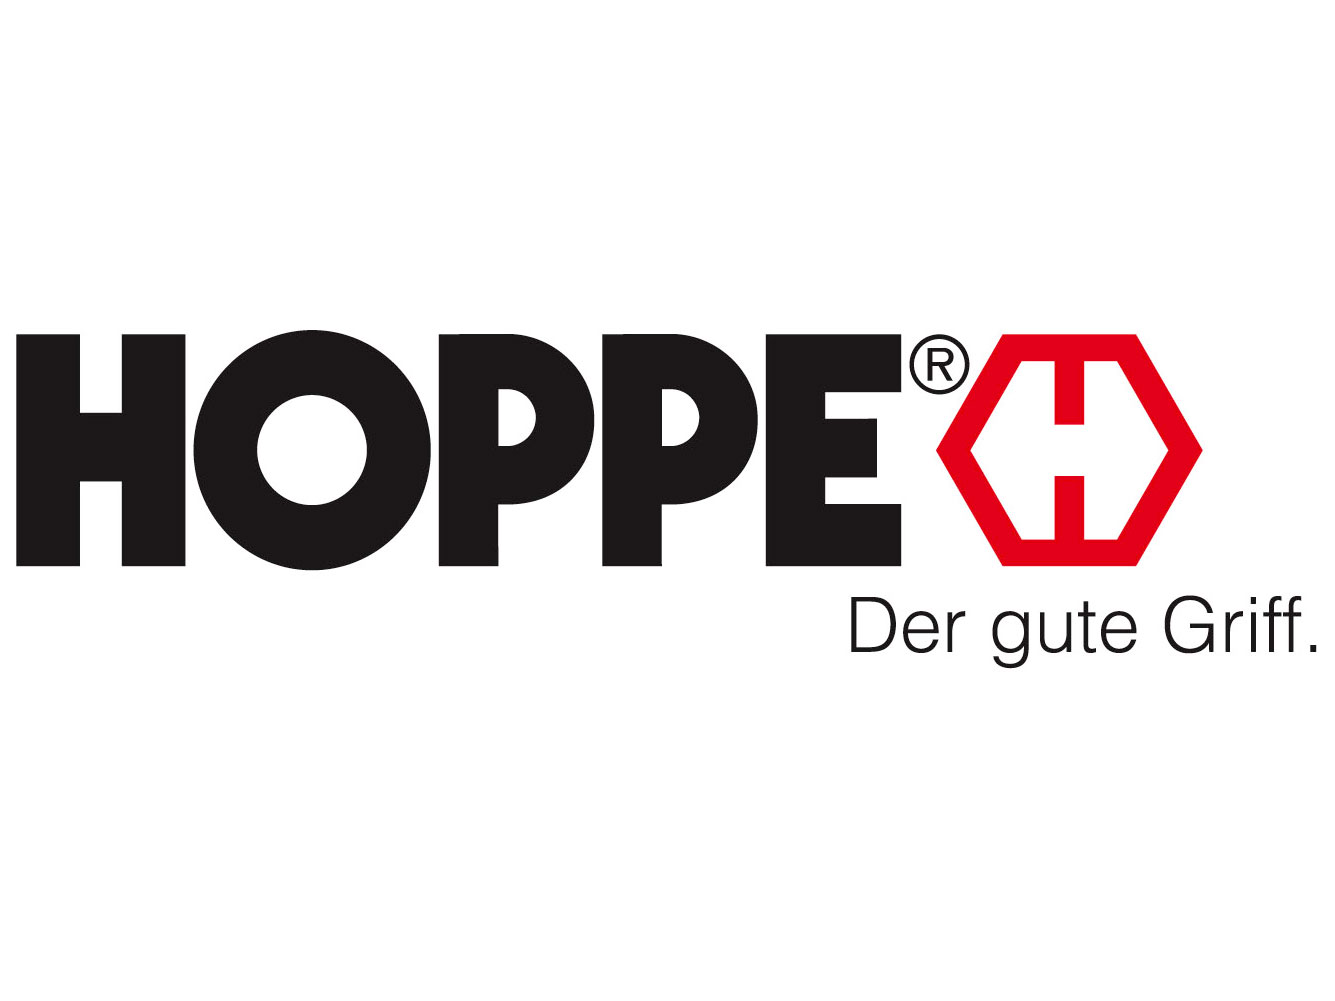 logo-partenaire-menuiserie-bitsch-quincailleries-fenetre-charpente-willemann-outillage